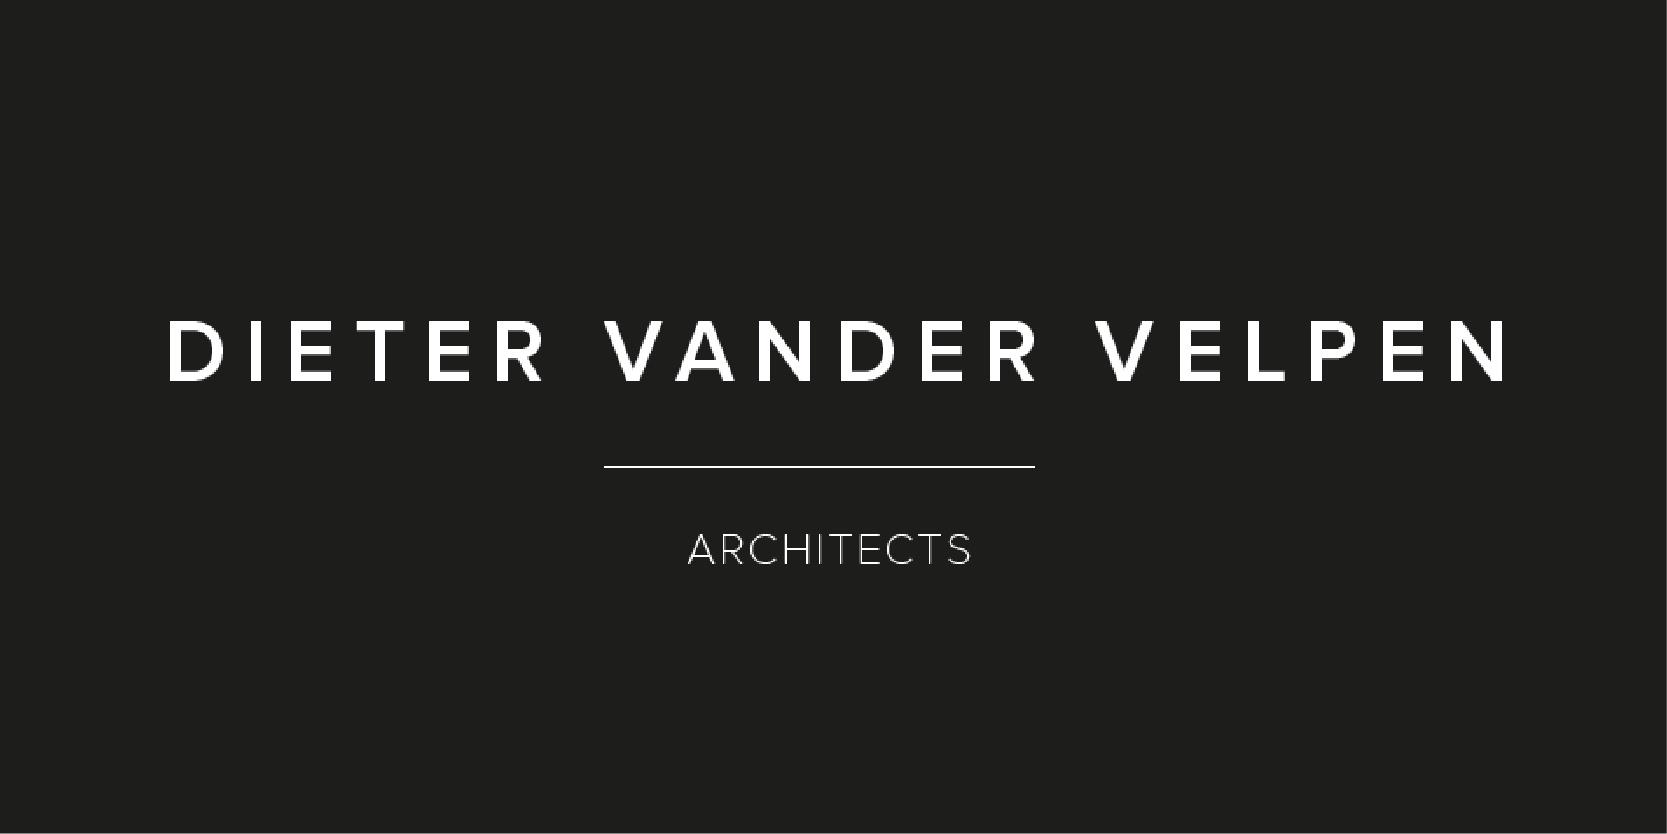 Dieter Vander Velpen